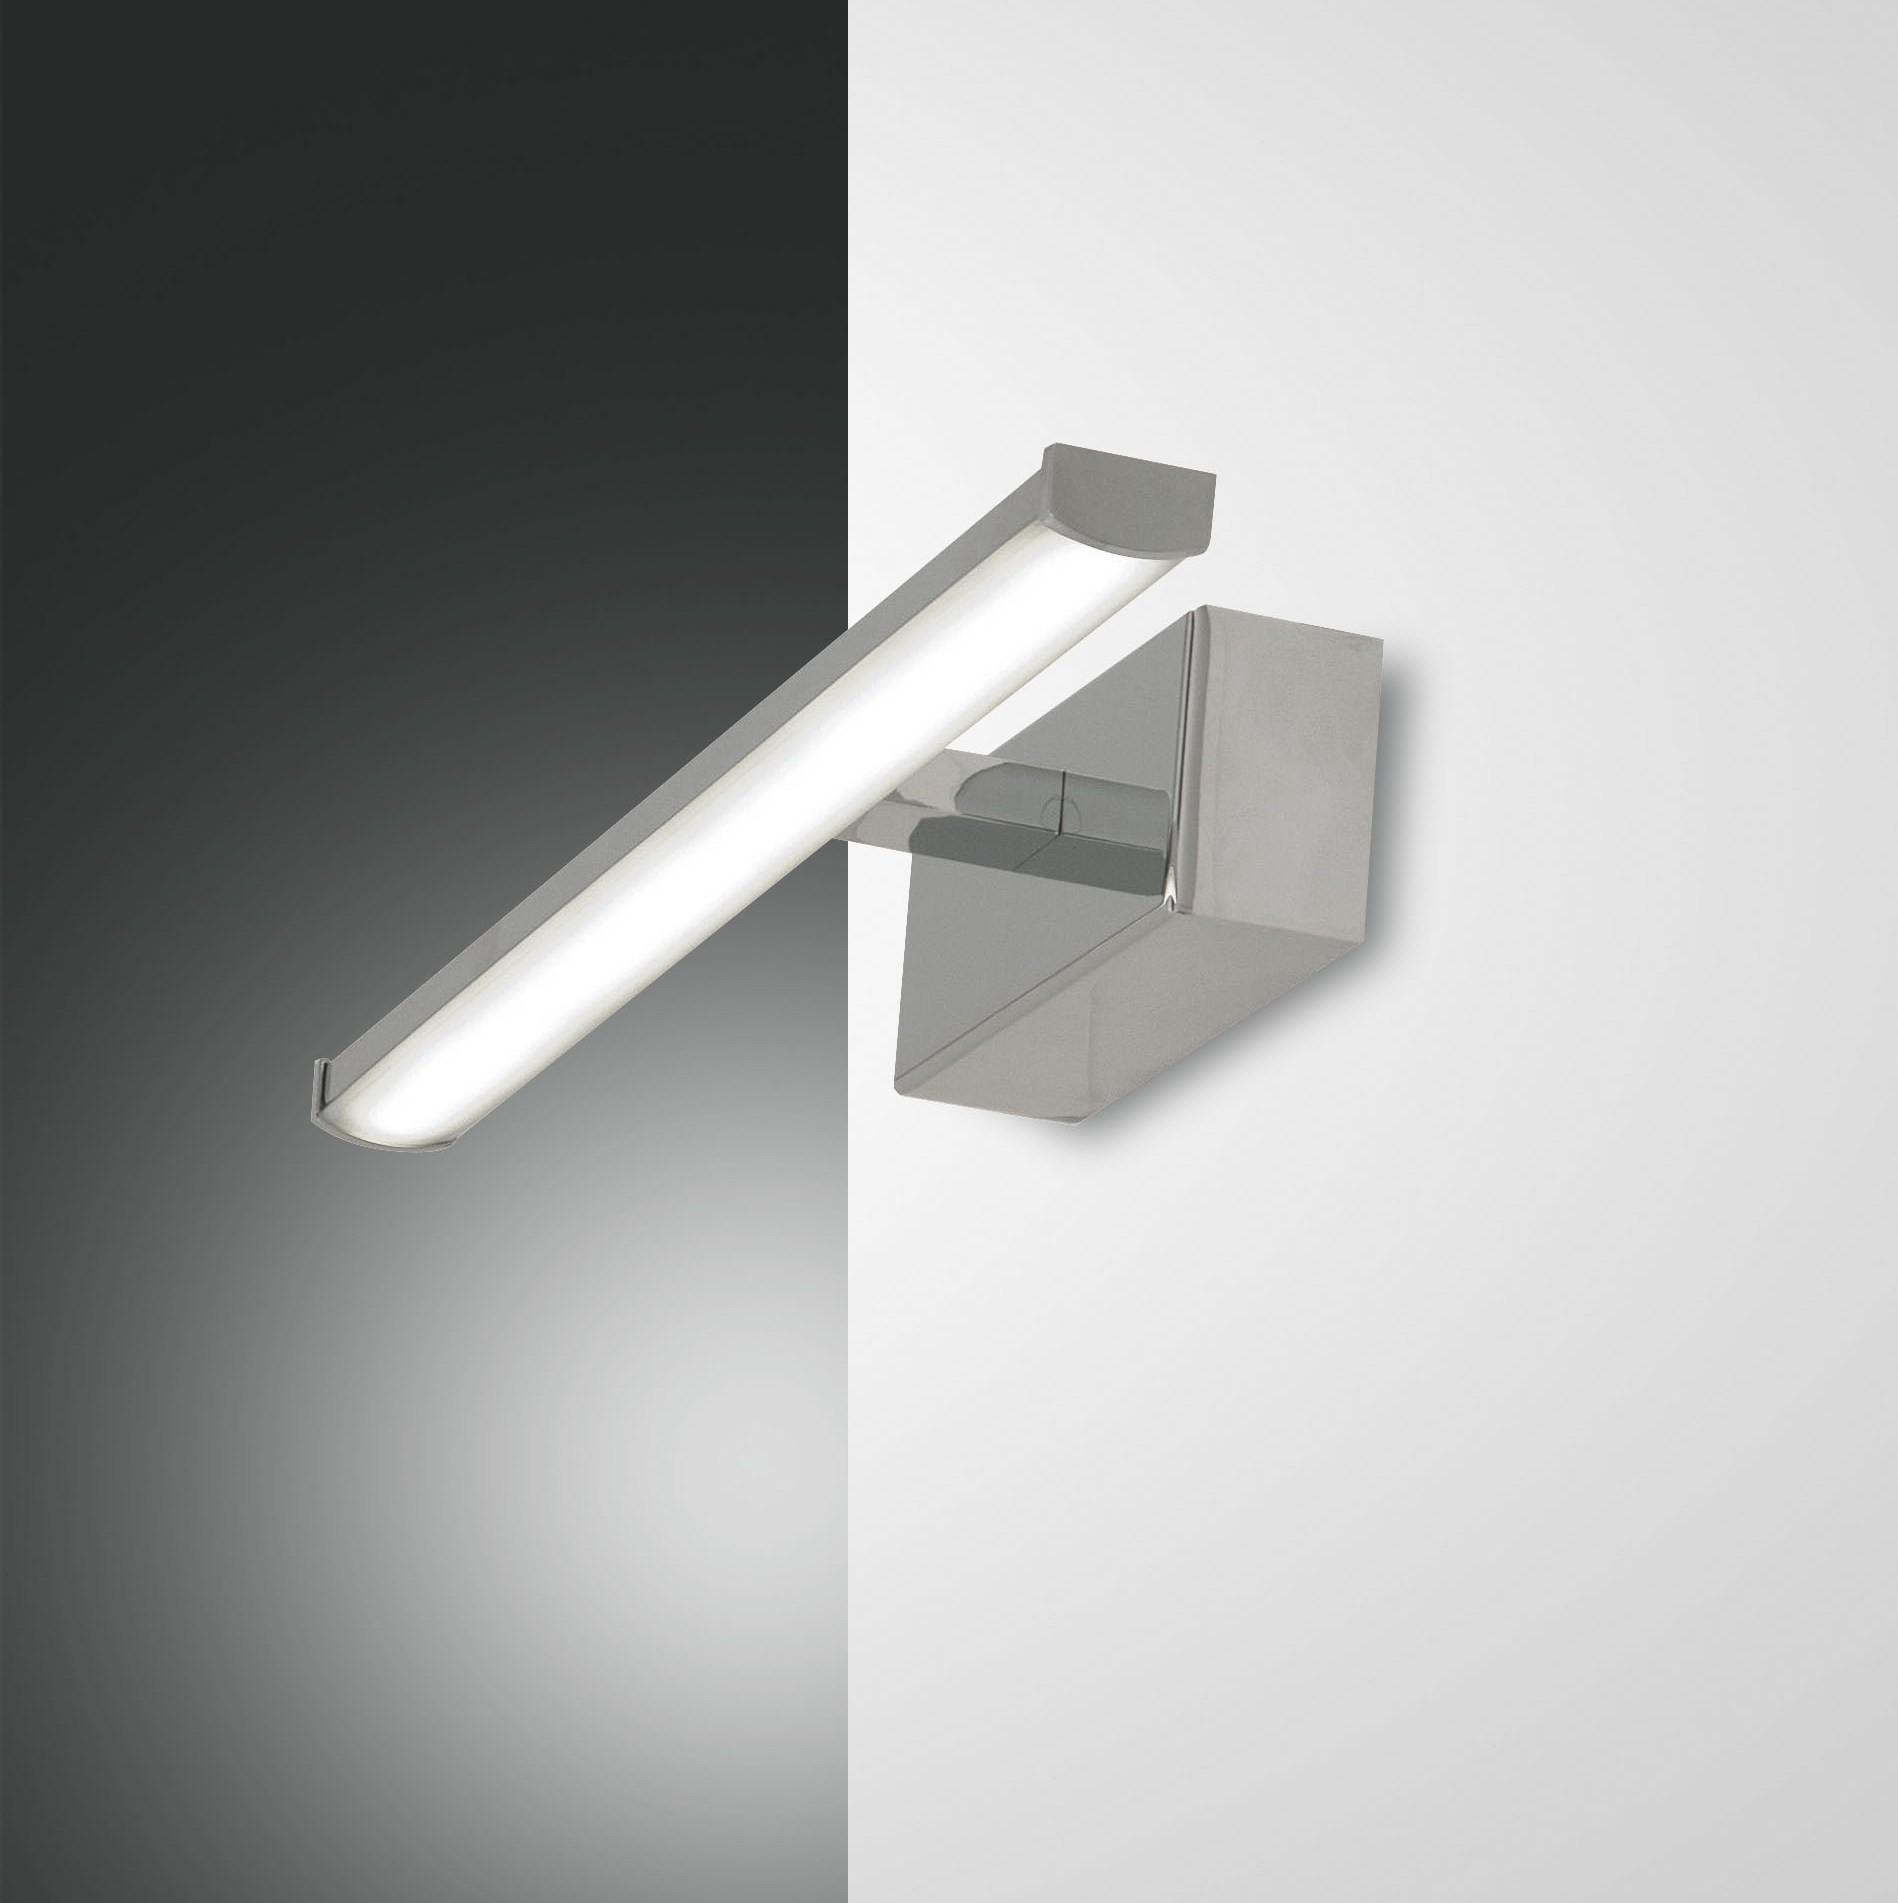 Applique de salle de bain LED Nala - Fabas Luce   Comptoir des Lustres